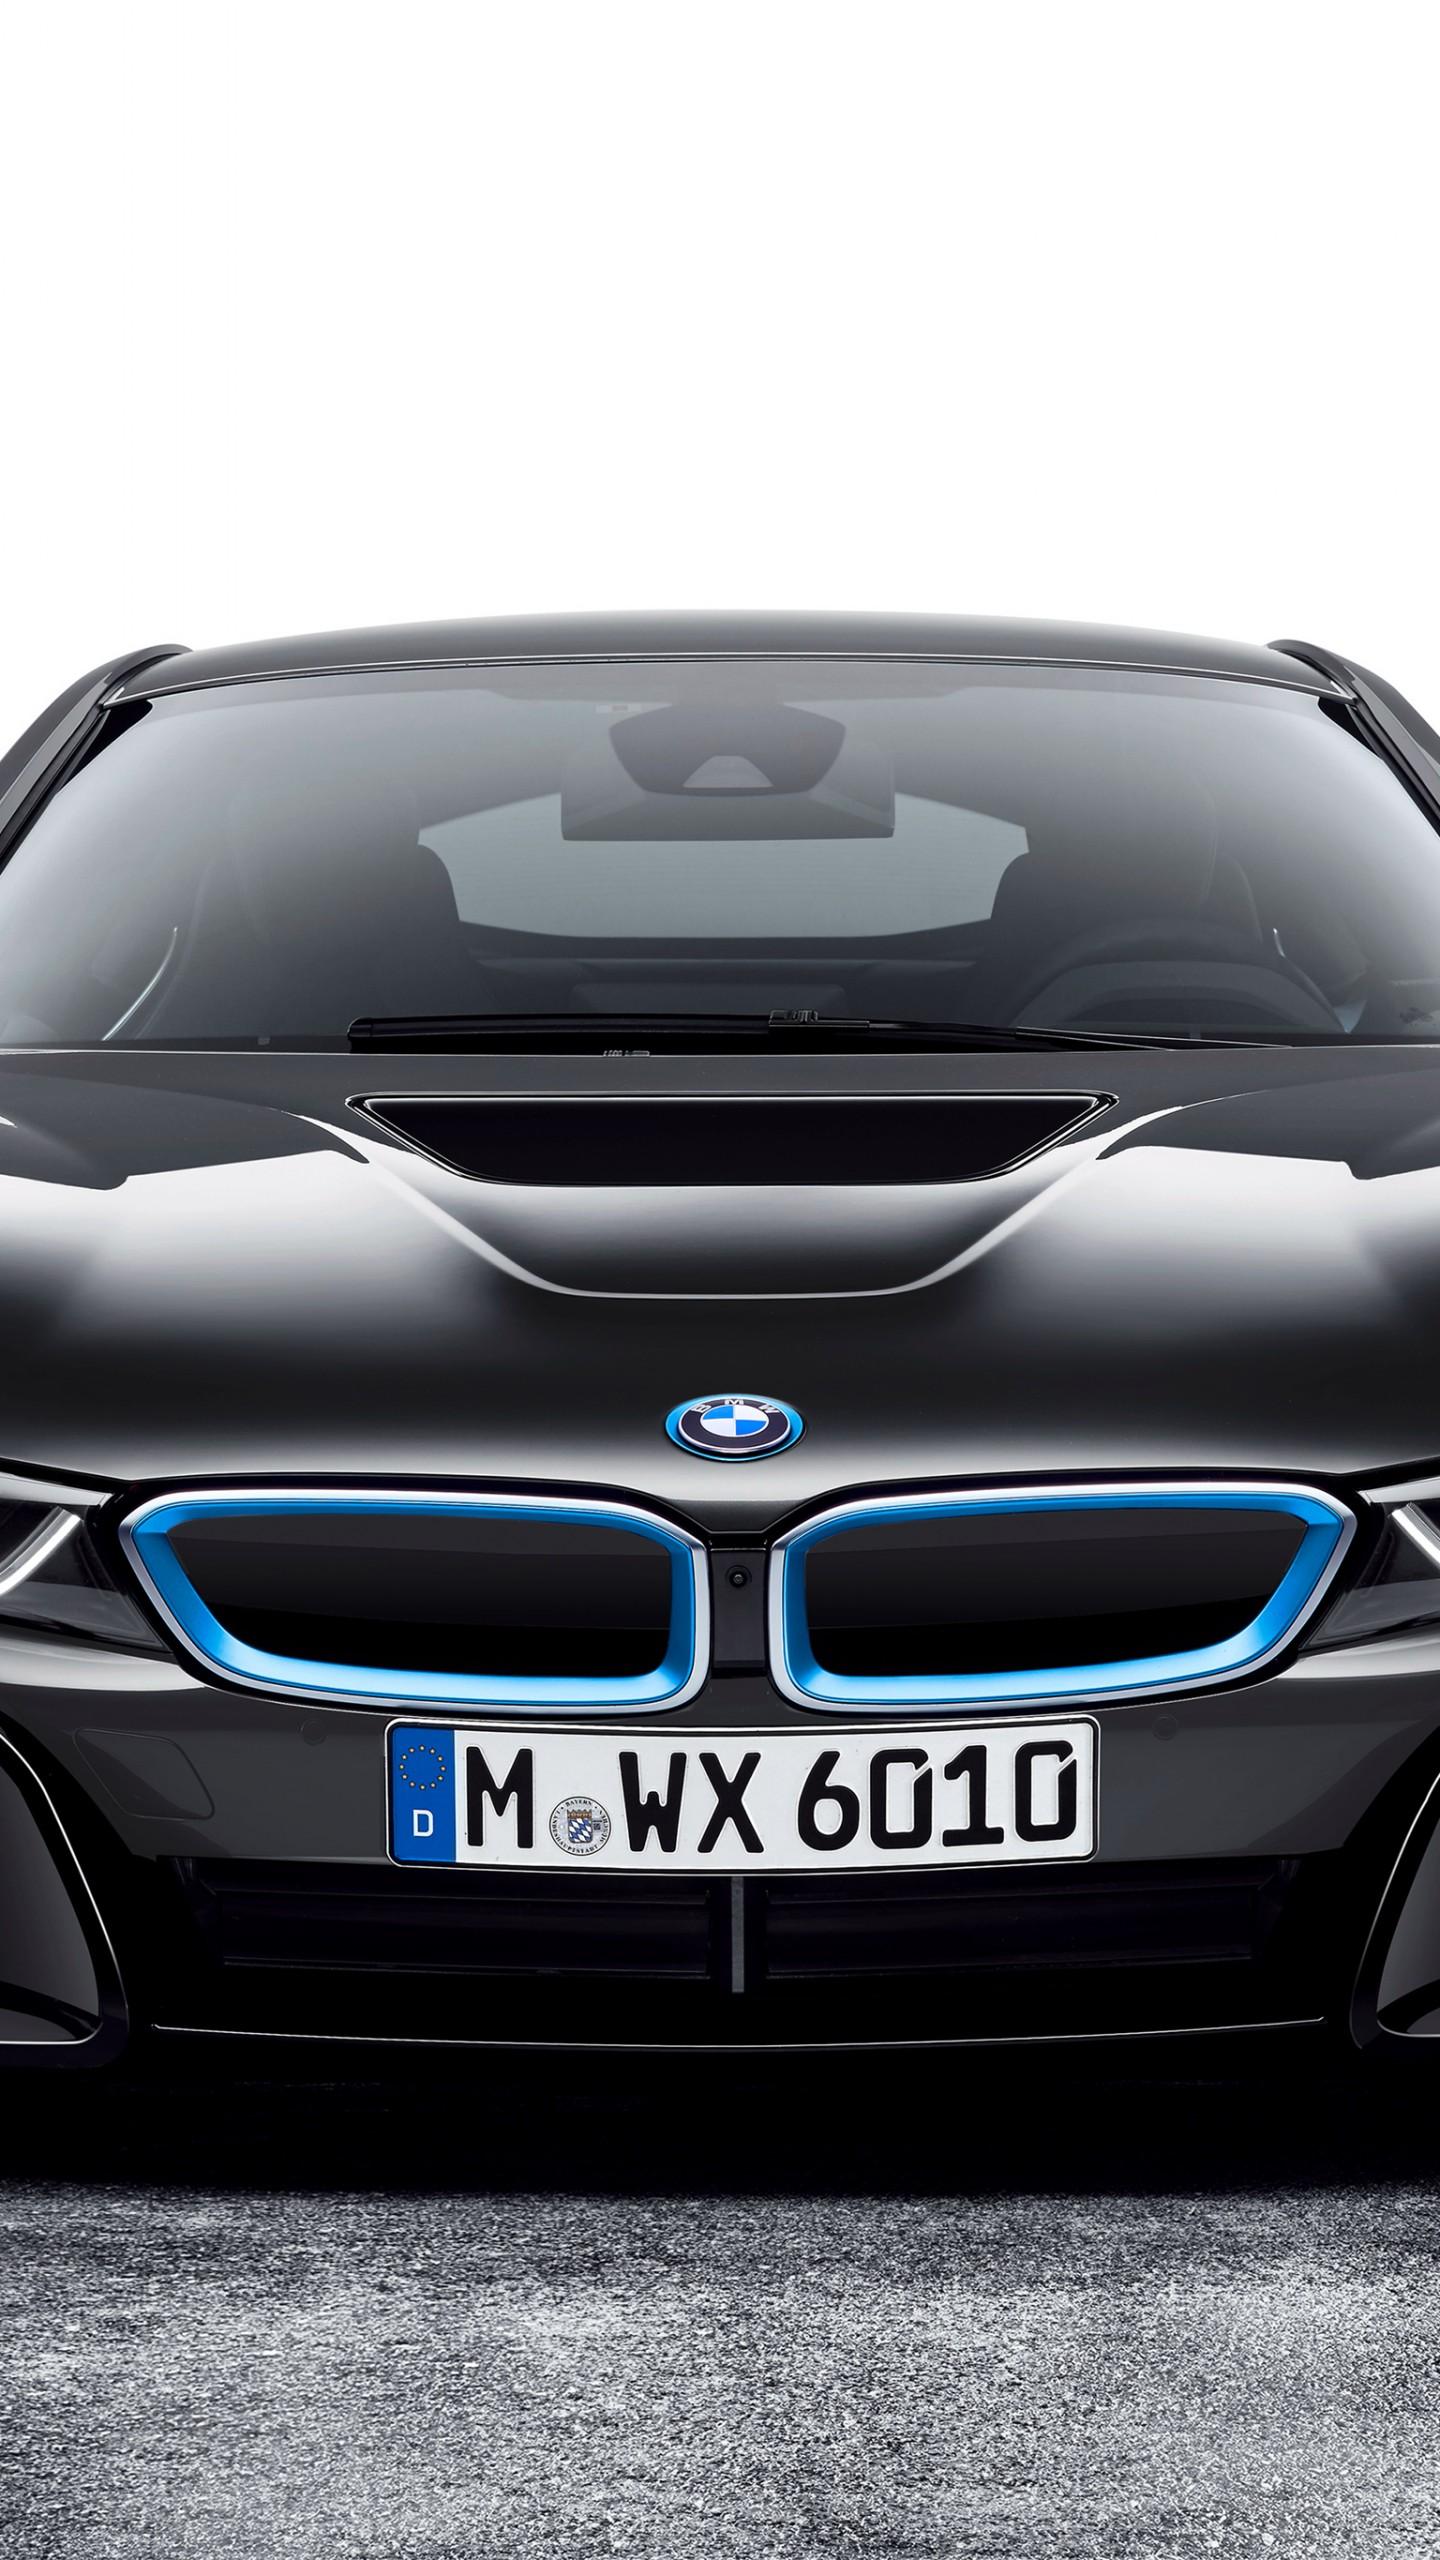 Wallpaper BMW i8, CES 2016, Hybrid, black, Cars & Bikes #8582